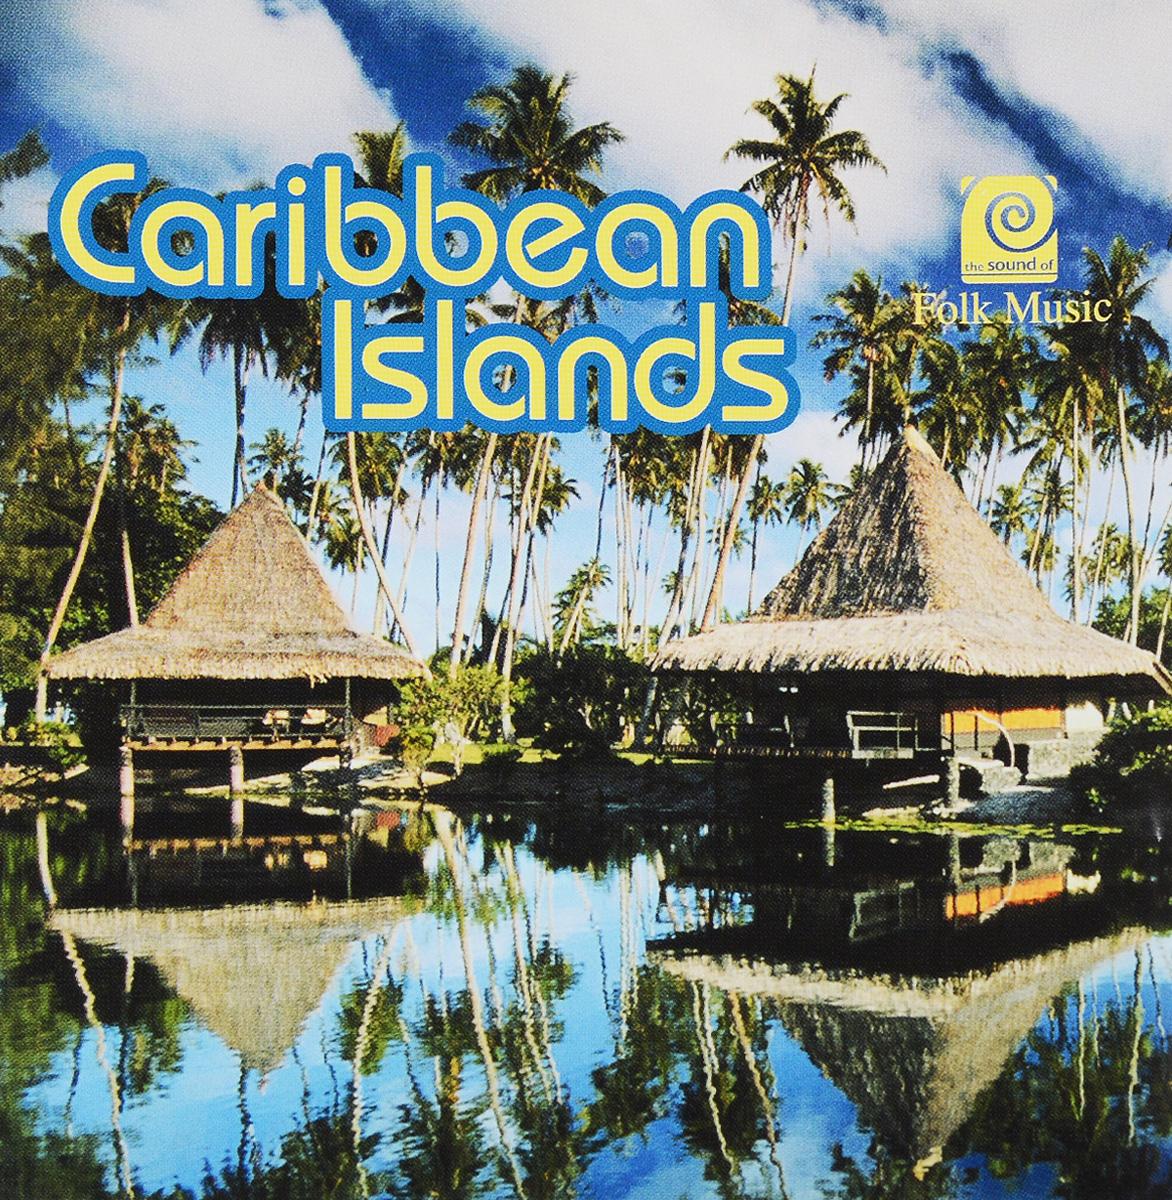 The Sound Of Folk Music - Caribbean Islands